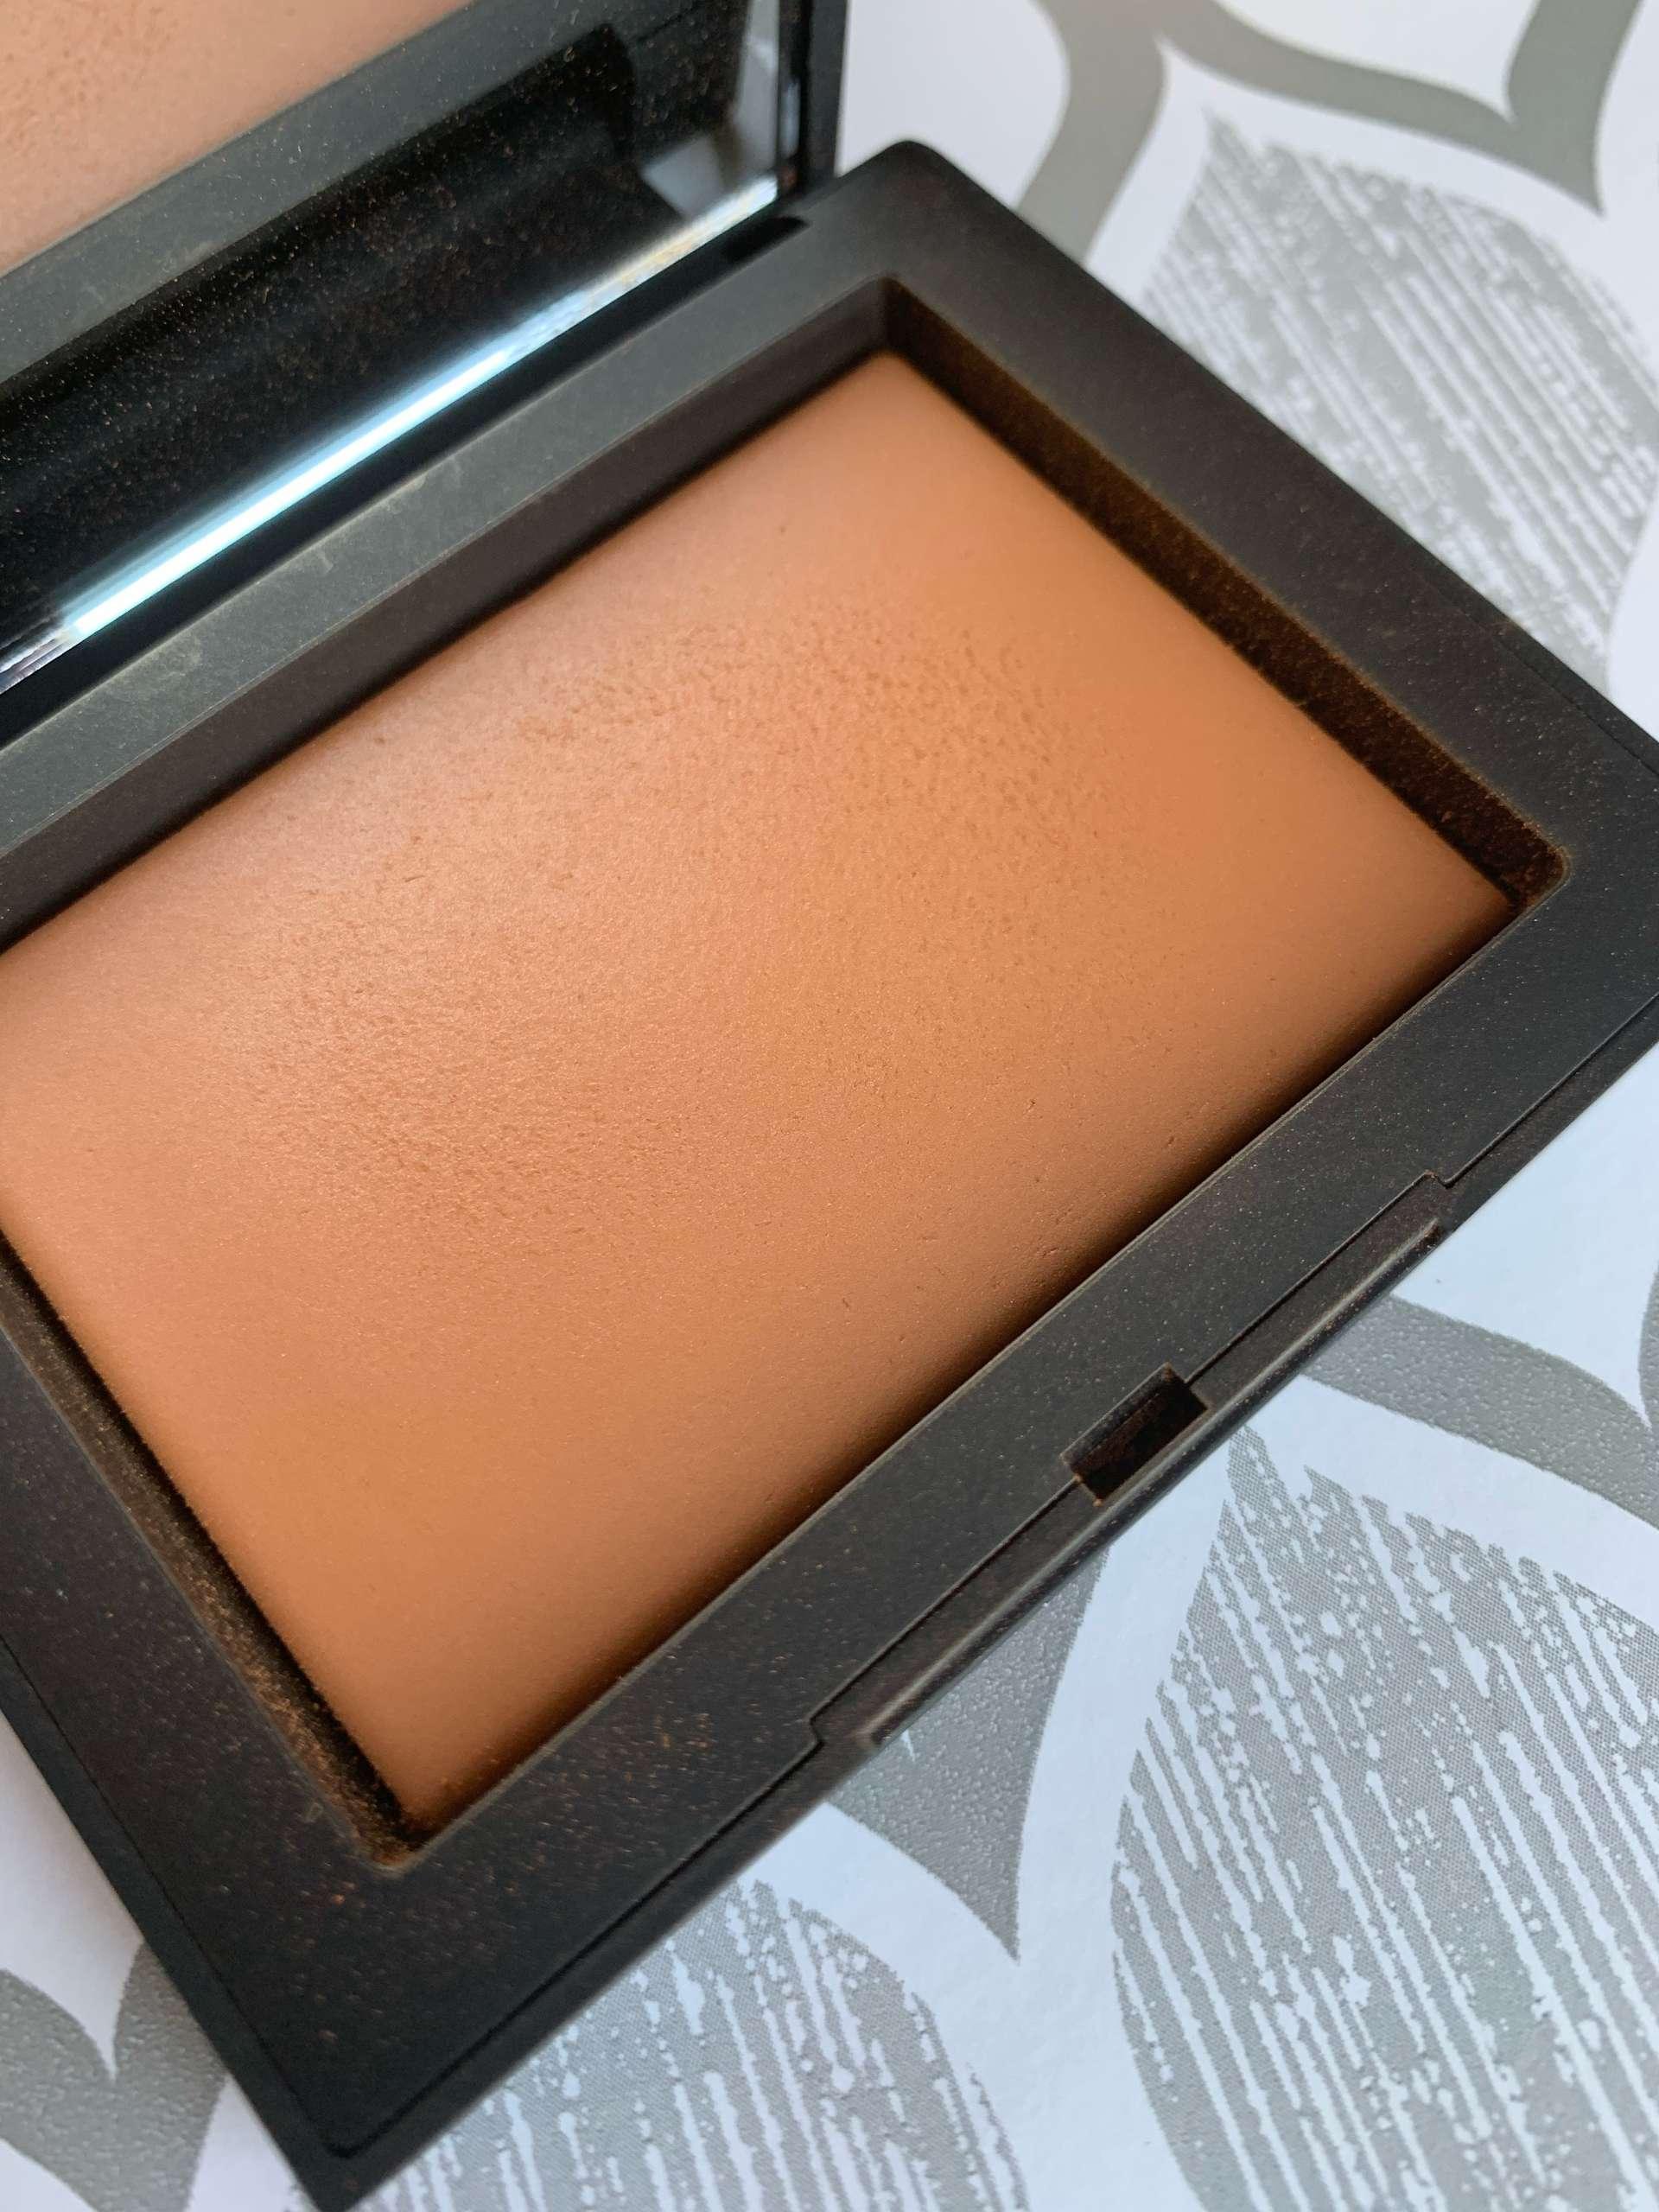 NARS Light Reflecting Pressed Setting Powder (sunstone) Swatch